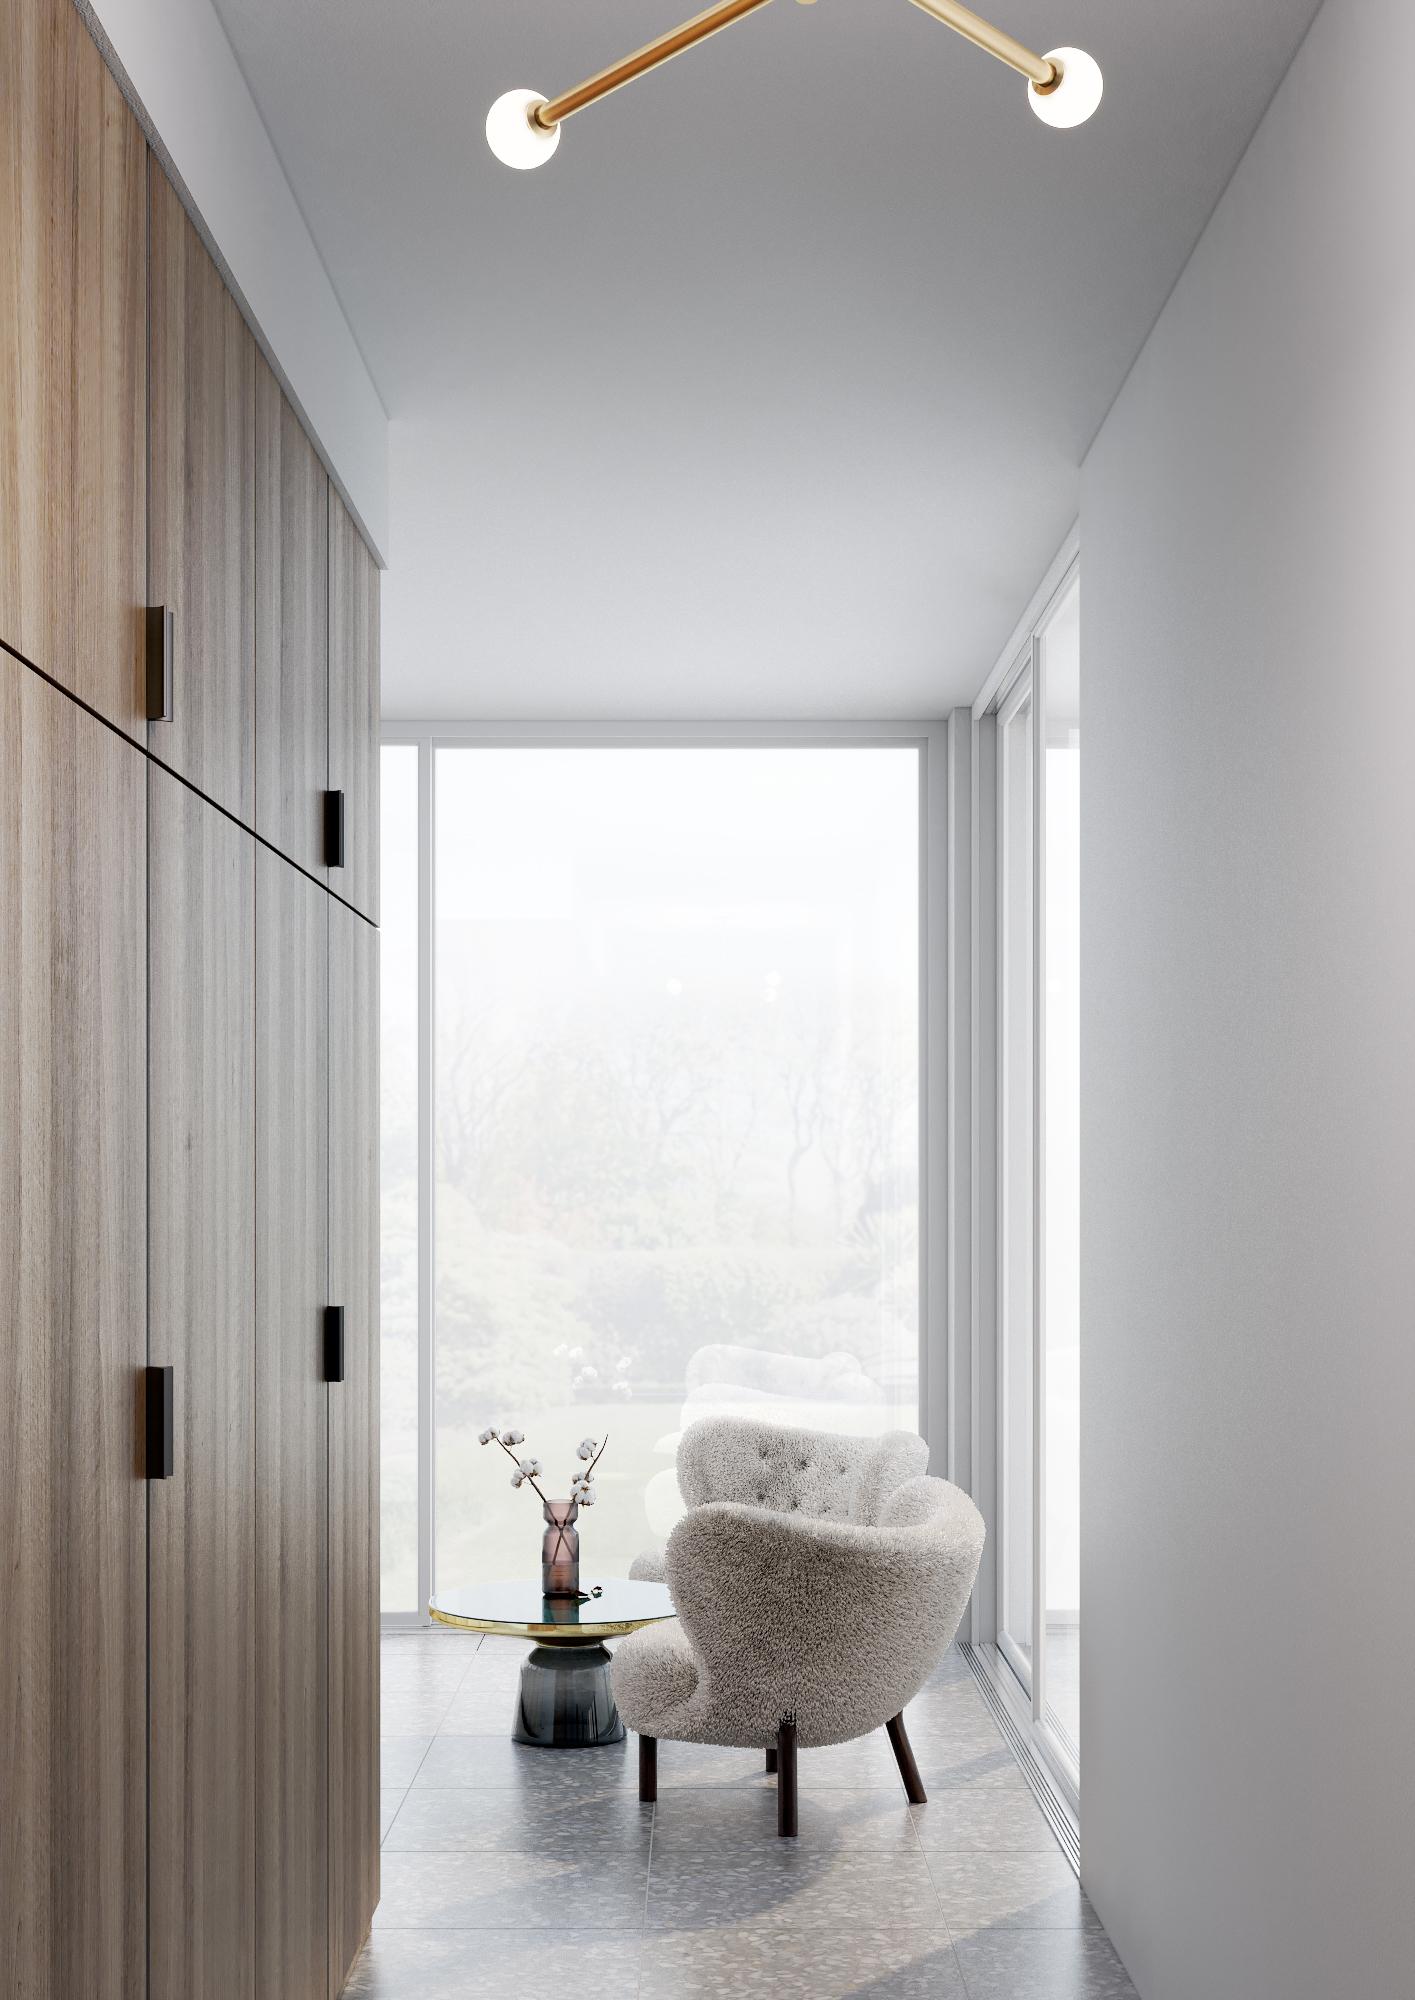 Bedroom_View03_28.07.2019.jpg